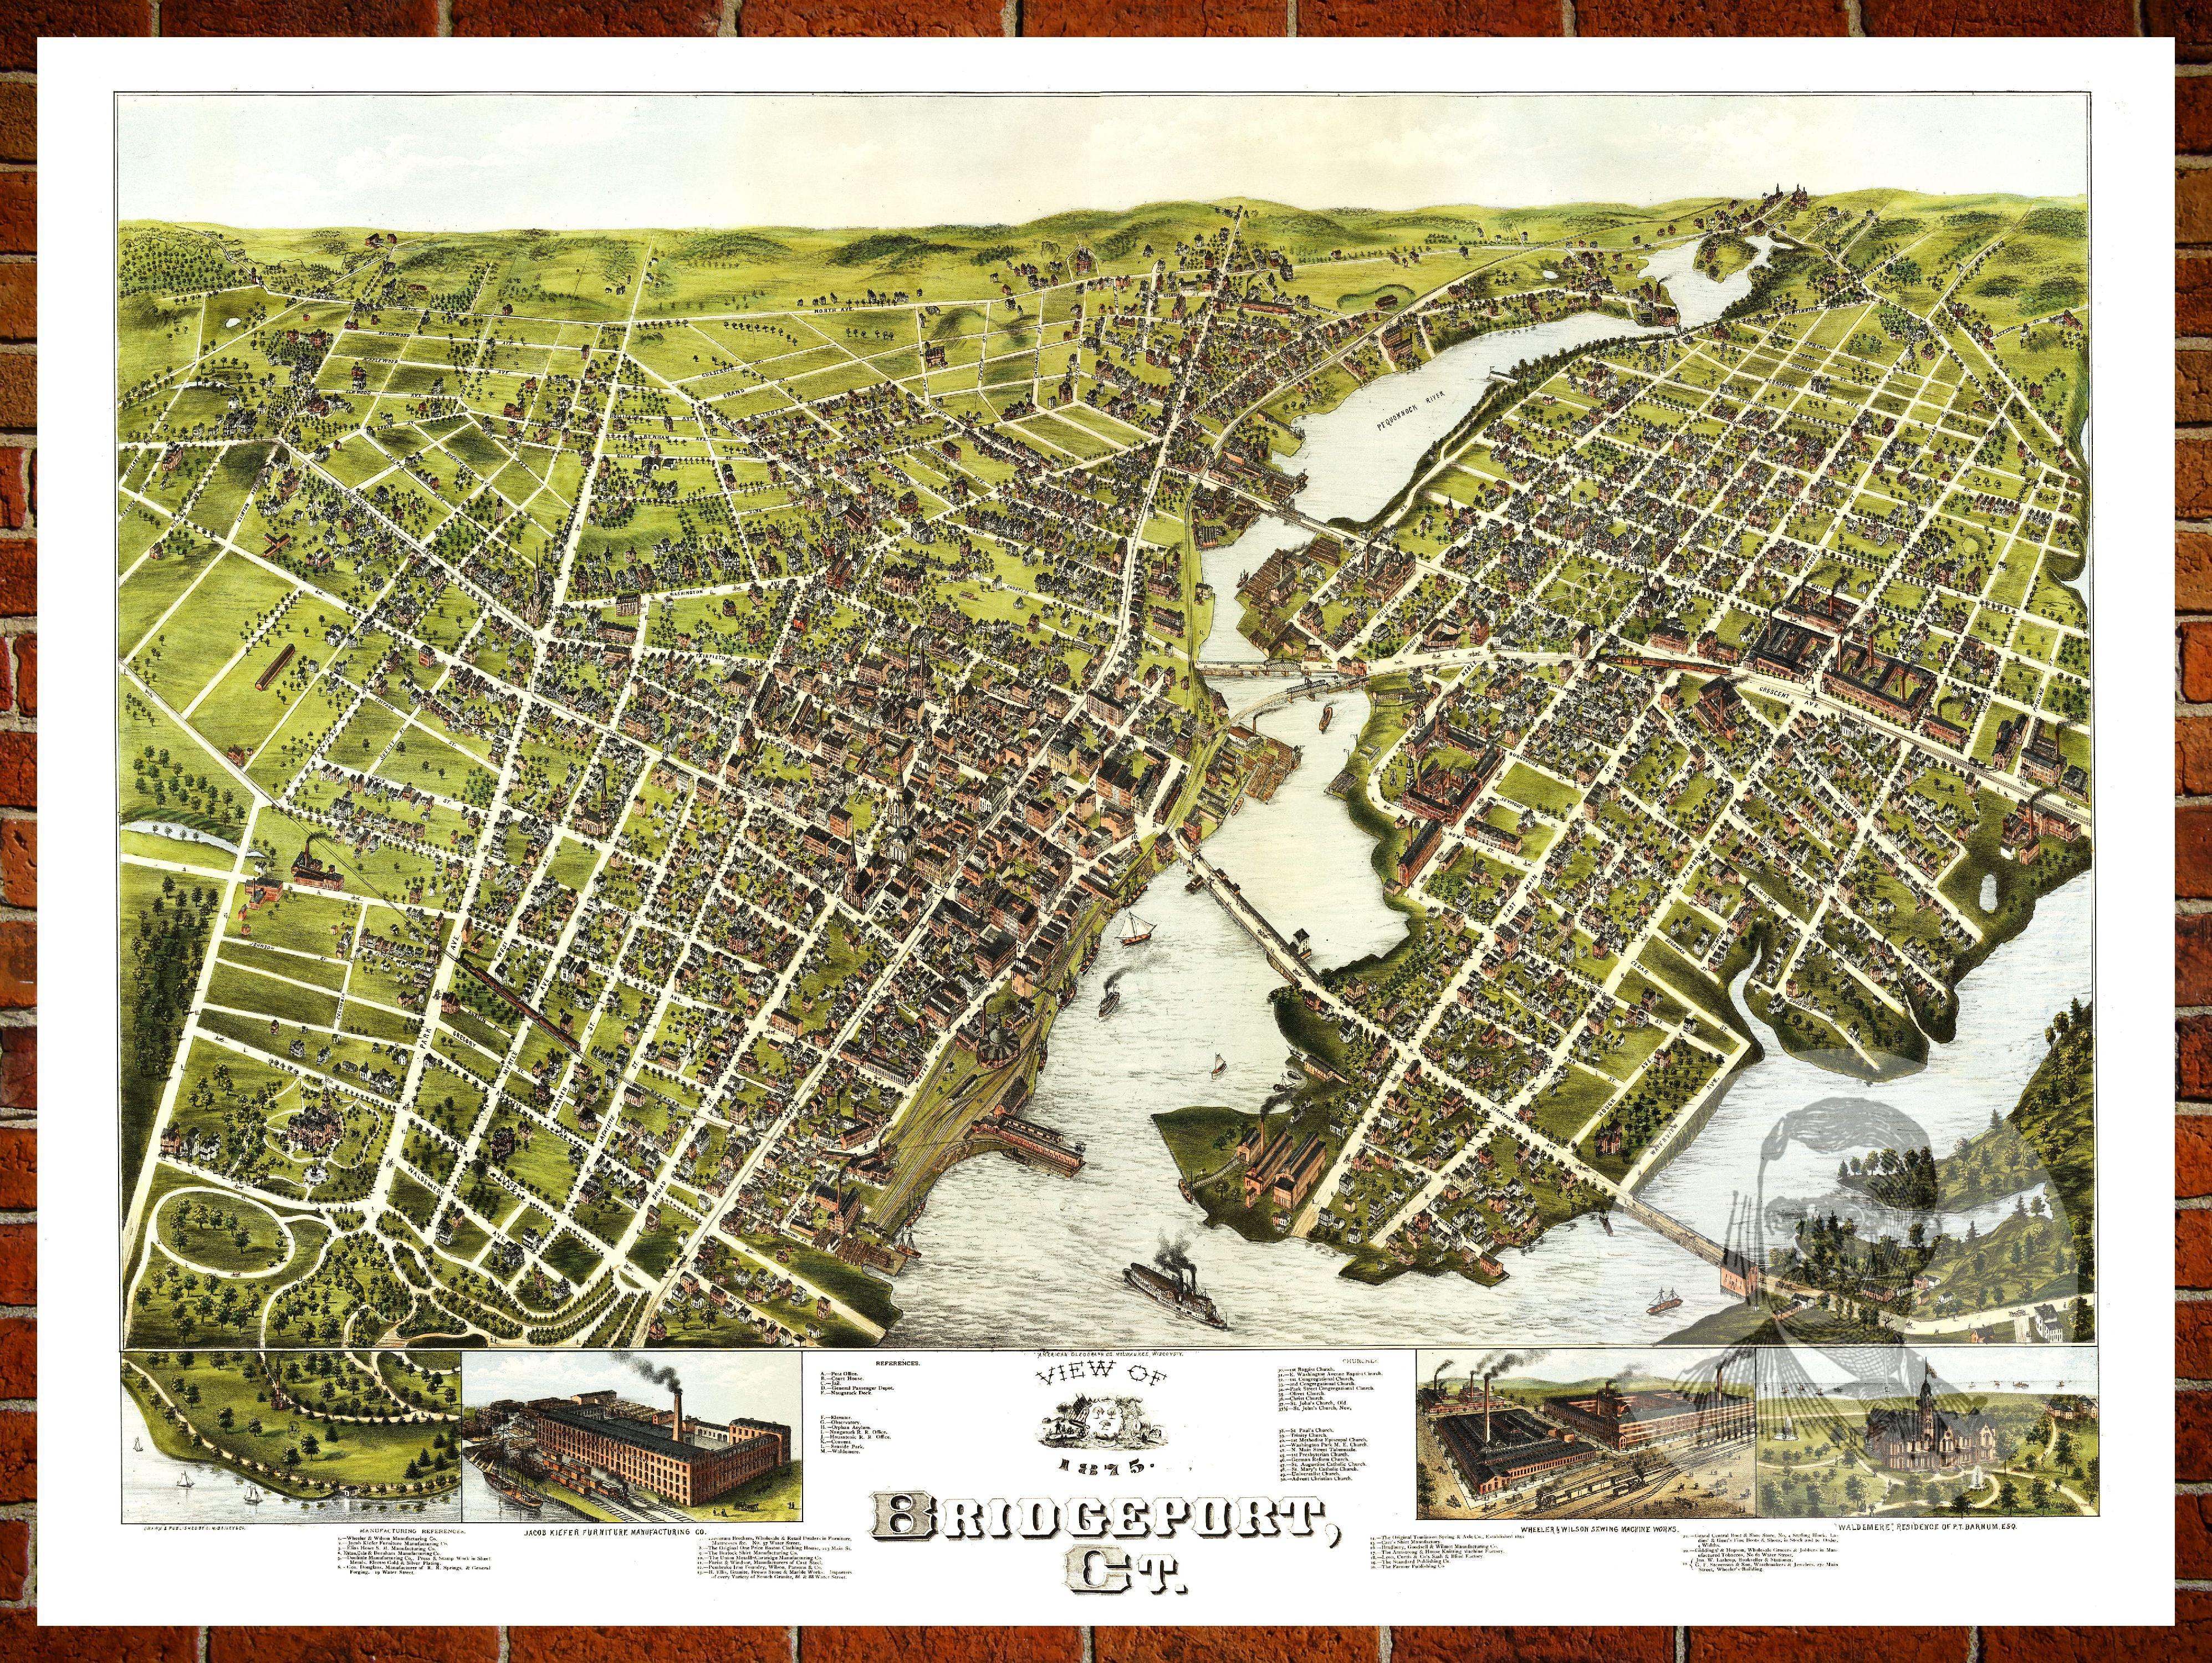 Ted S Vintage Art Map Of Bridgeport Ct 1875 Old Connecticut Decor 24 X 36 Walmart Com Walmart Com